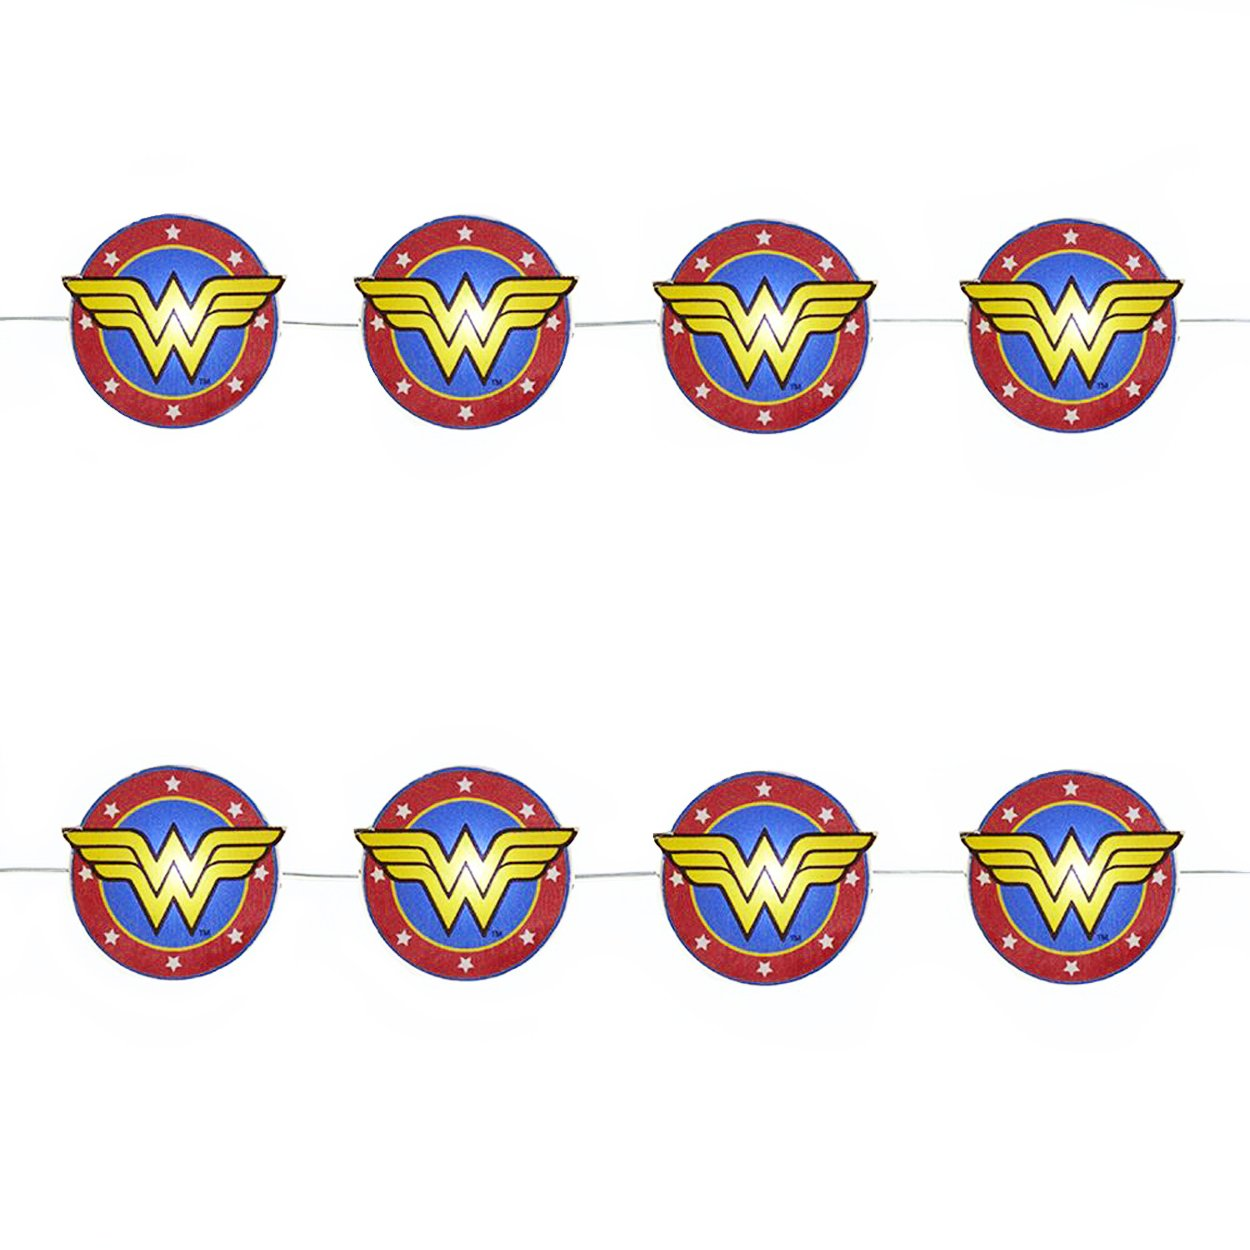 Kurt Adler DC Comics Wonder Woman Christmas Holiday LED Fairy Lights Boxed (Red)